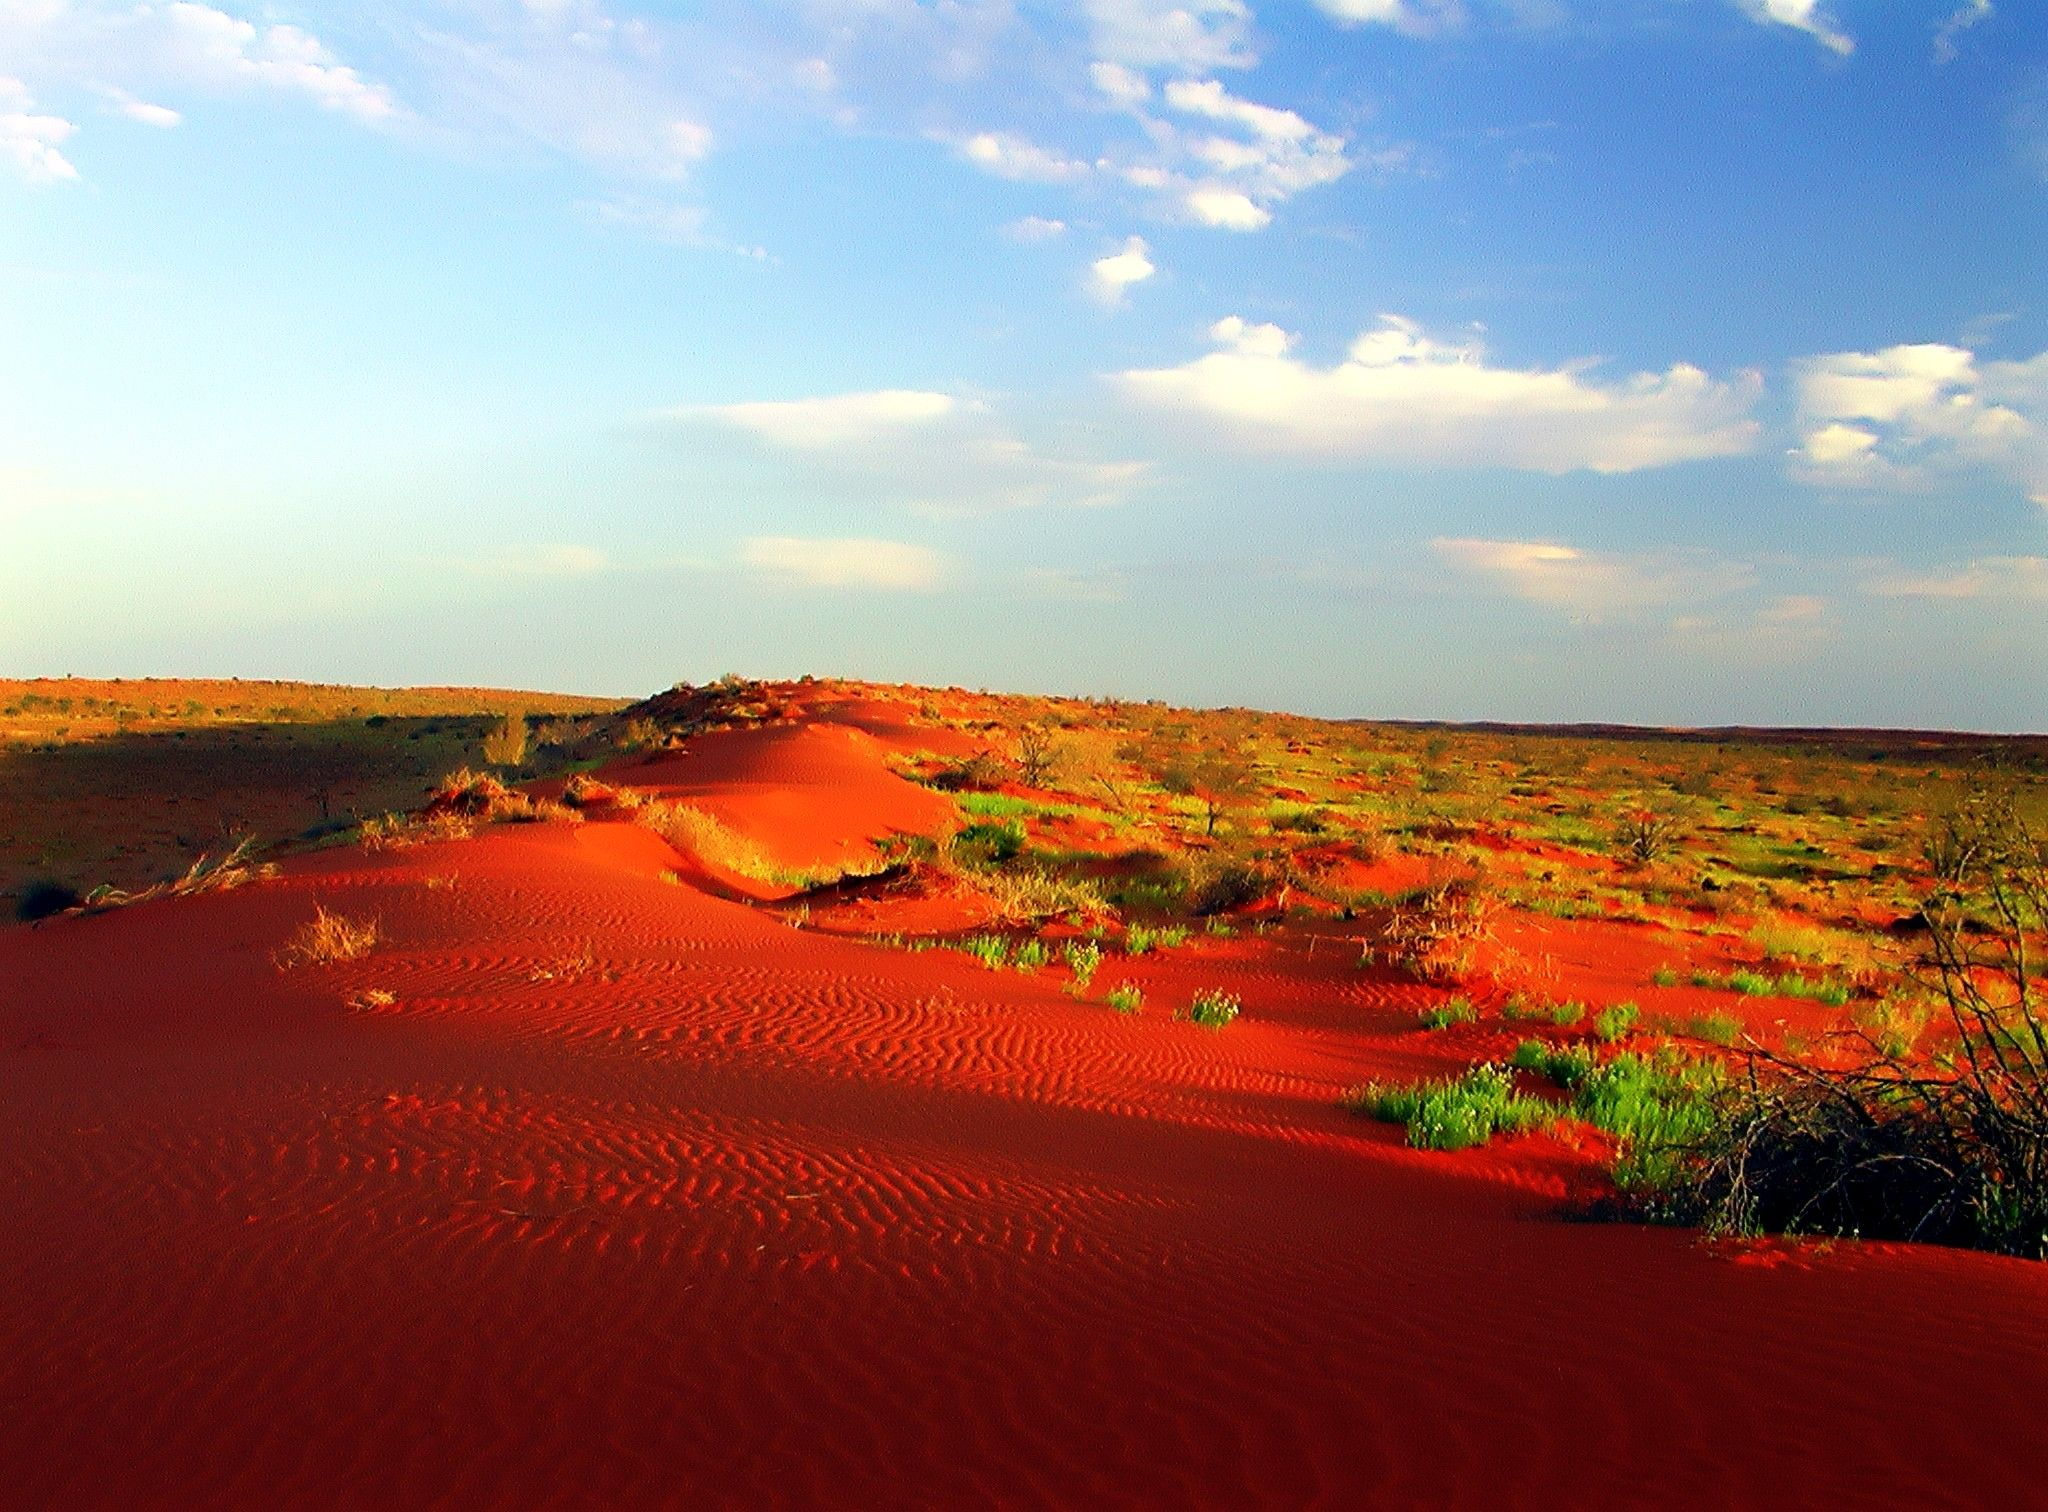 Simpson Desert, Australia Located within the driest region